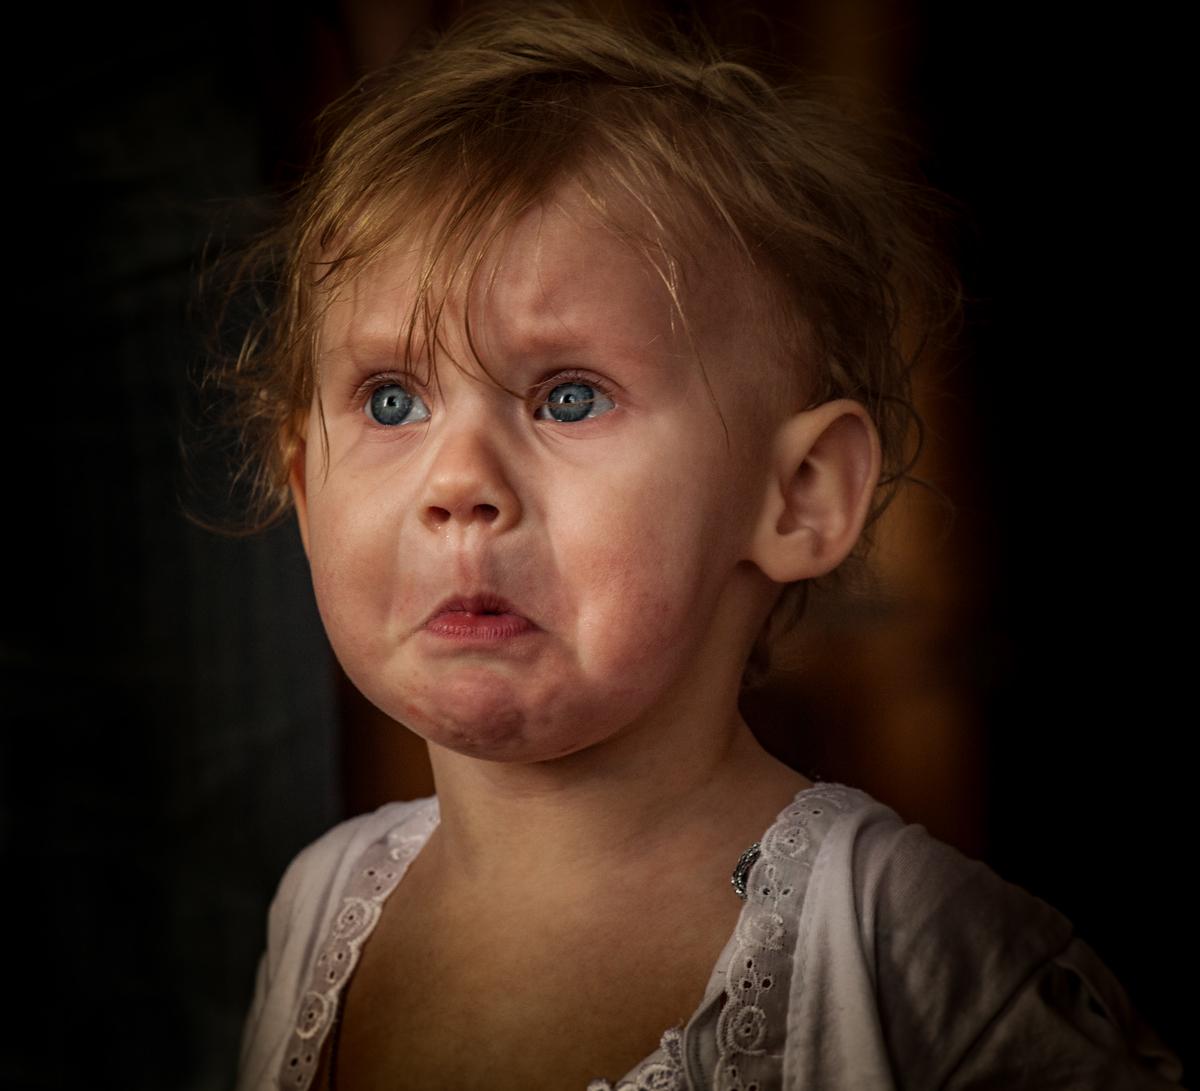 Картинка ребенок которого обидели